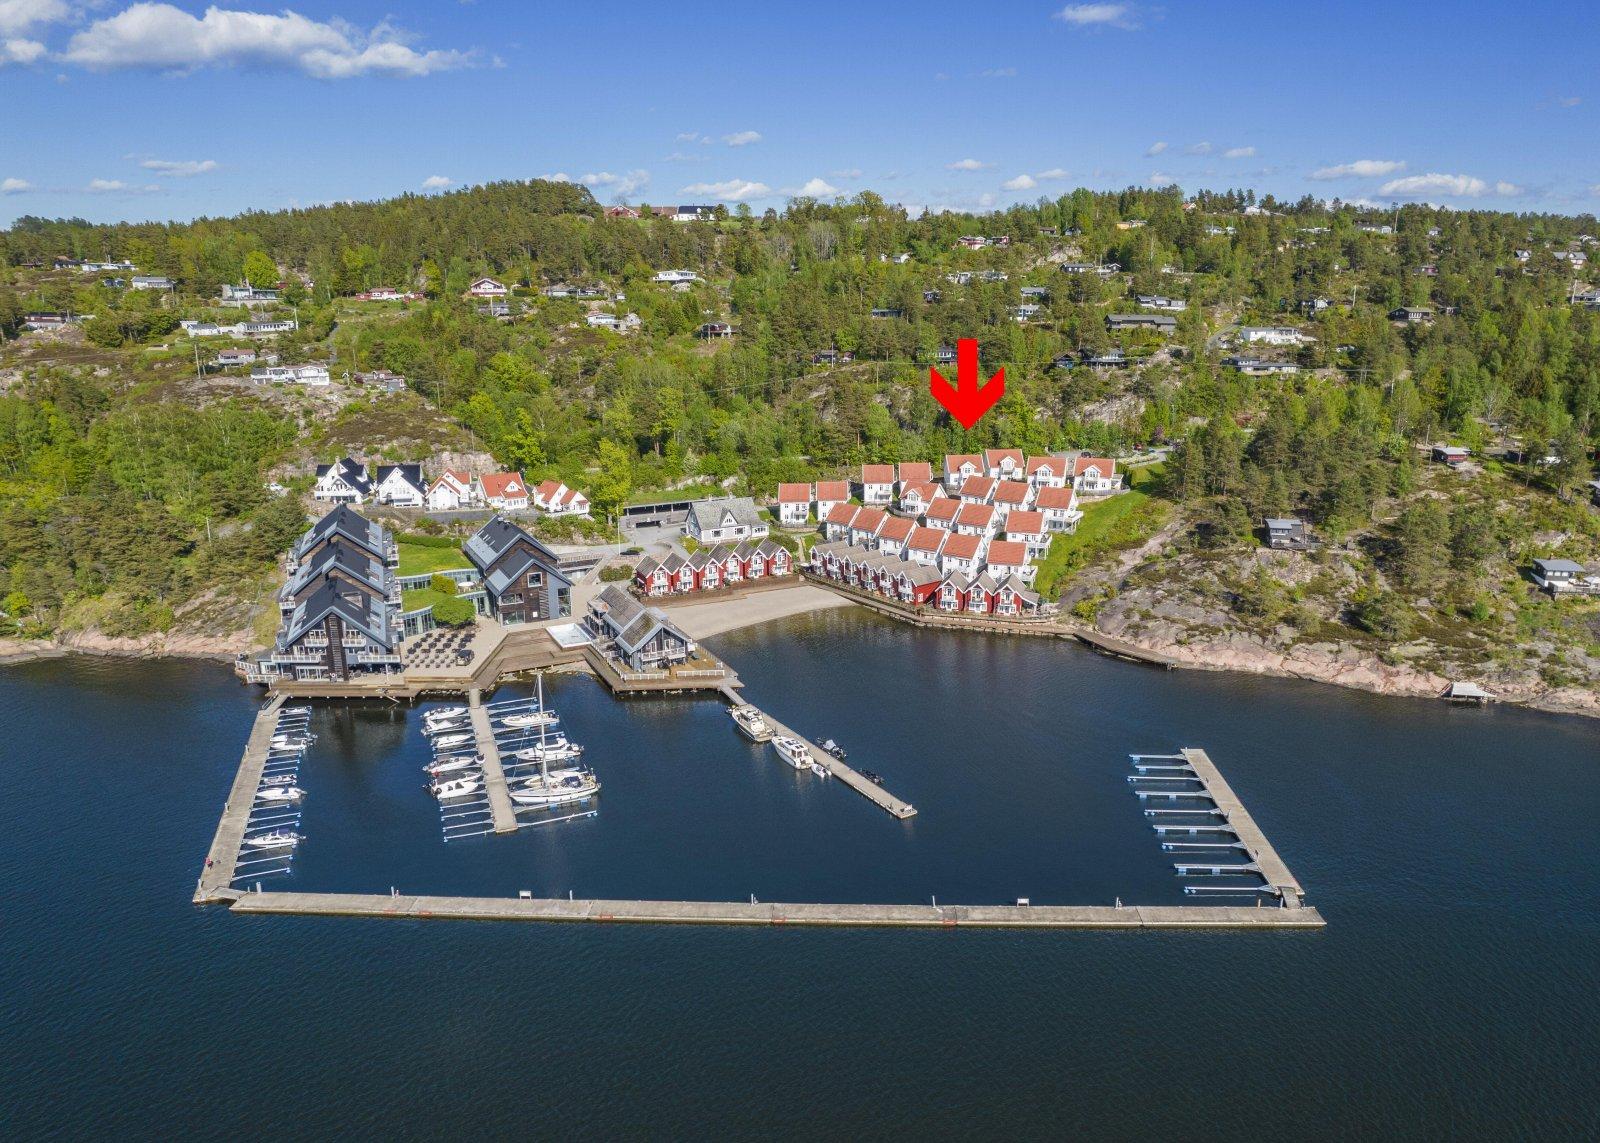 Hytta er beliggende på området som tidligere var tilknyttet Holmsbu Spa og Resort